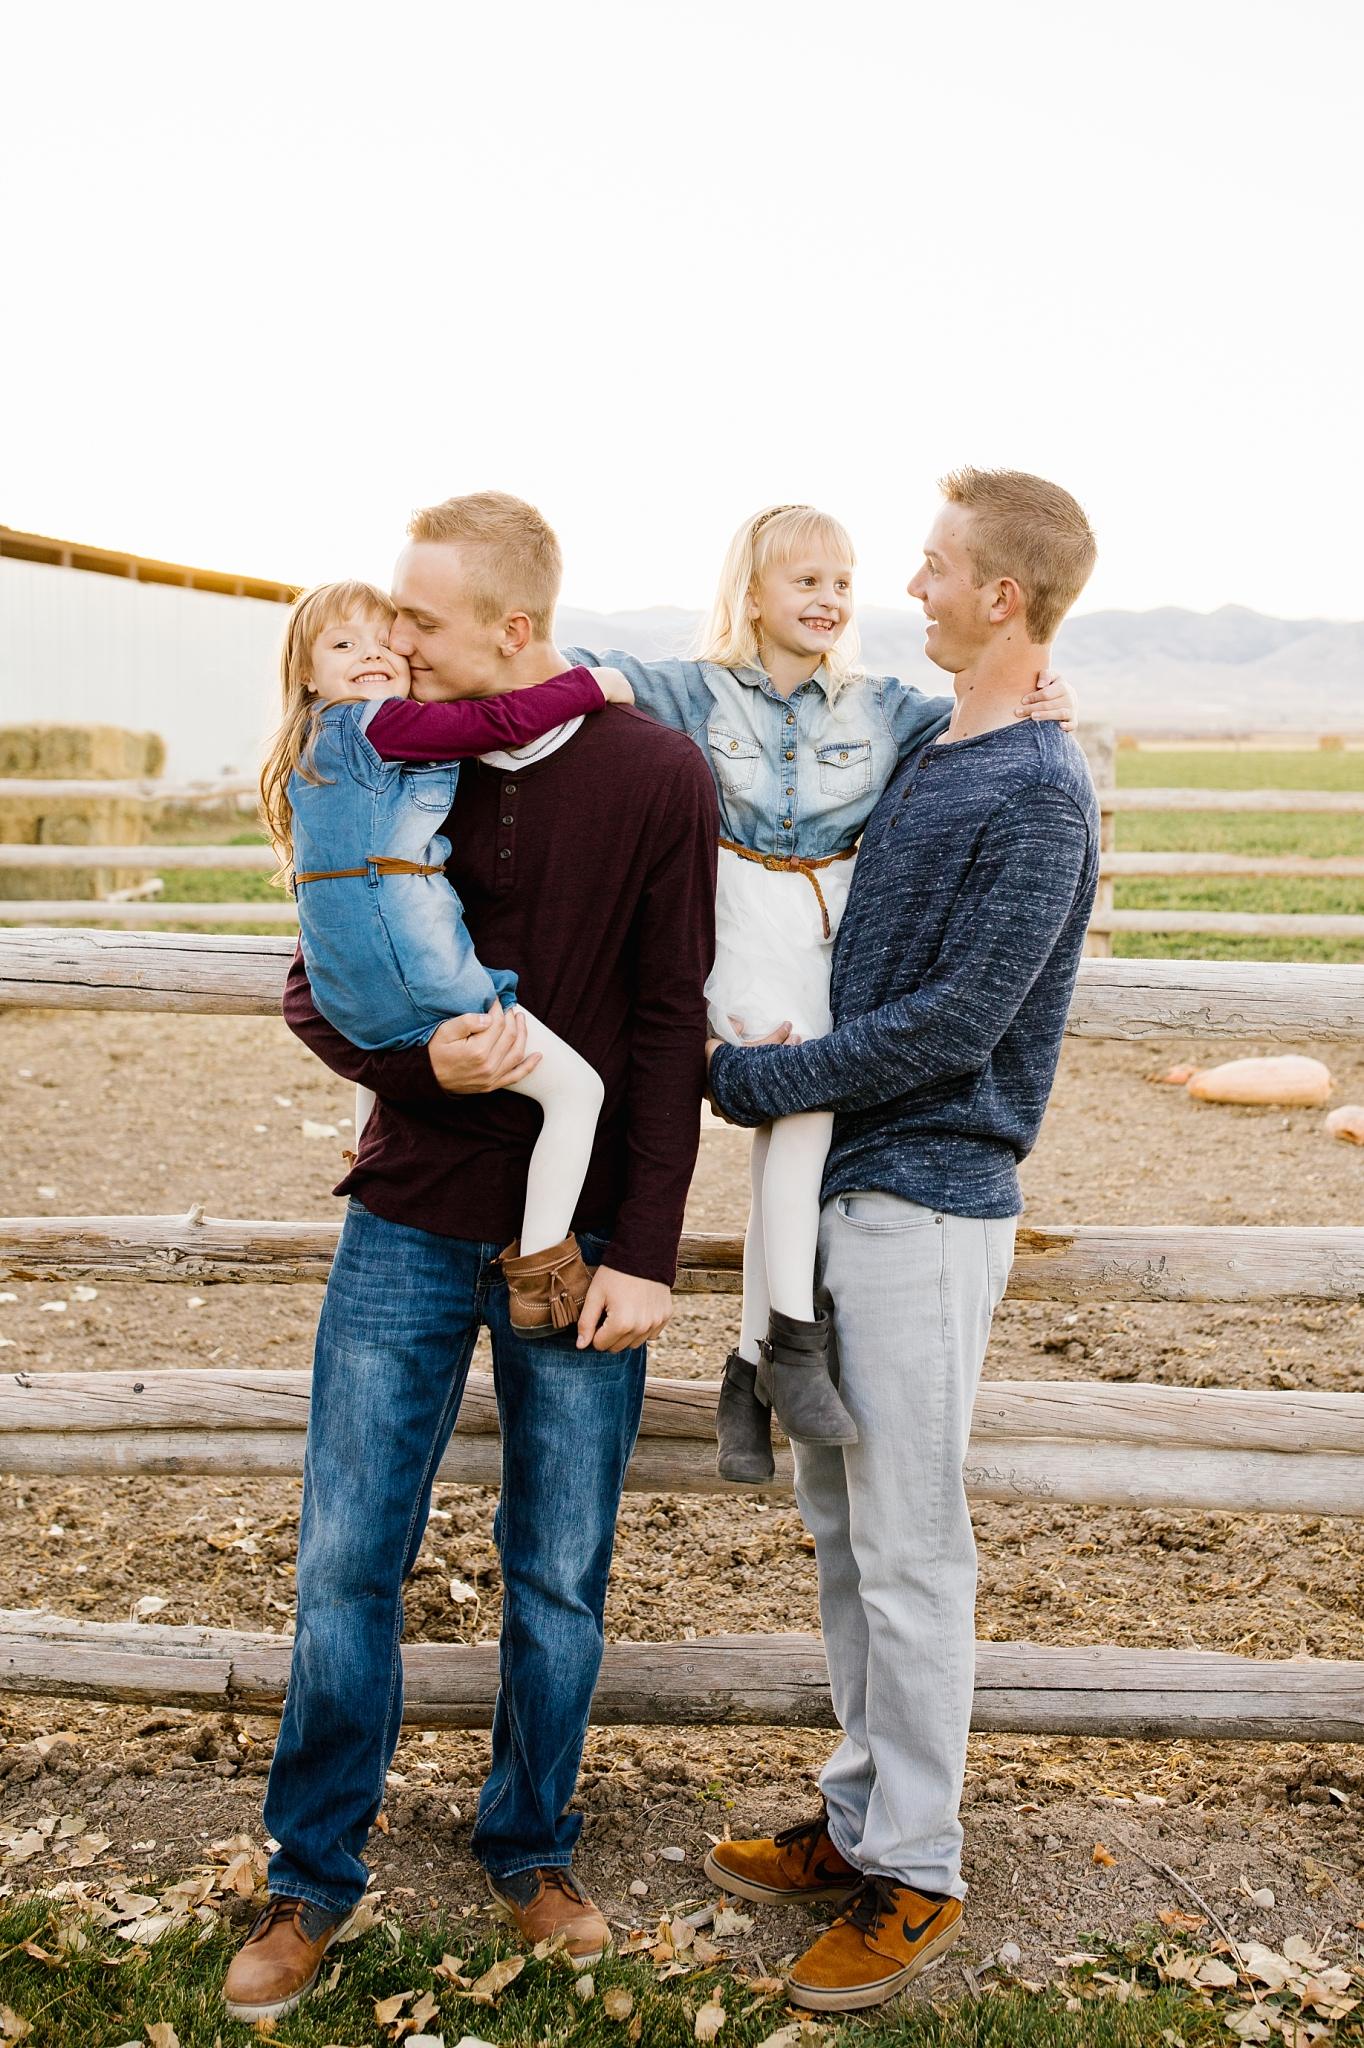 Mickelsen-59_Lizzie-B-Imagery-Utah-Family-Photographer-Lifestyle-Photography-Salt-Lake-City-Park-City-Utah-County.jpg